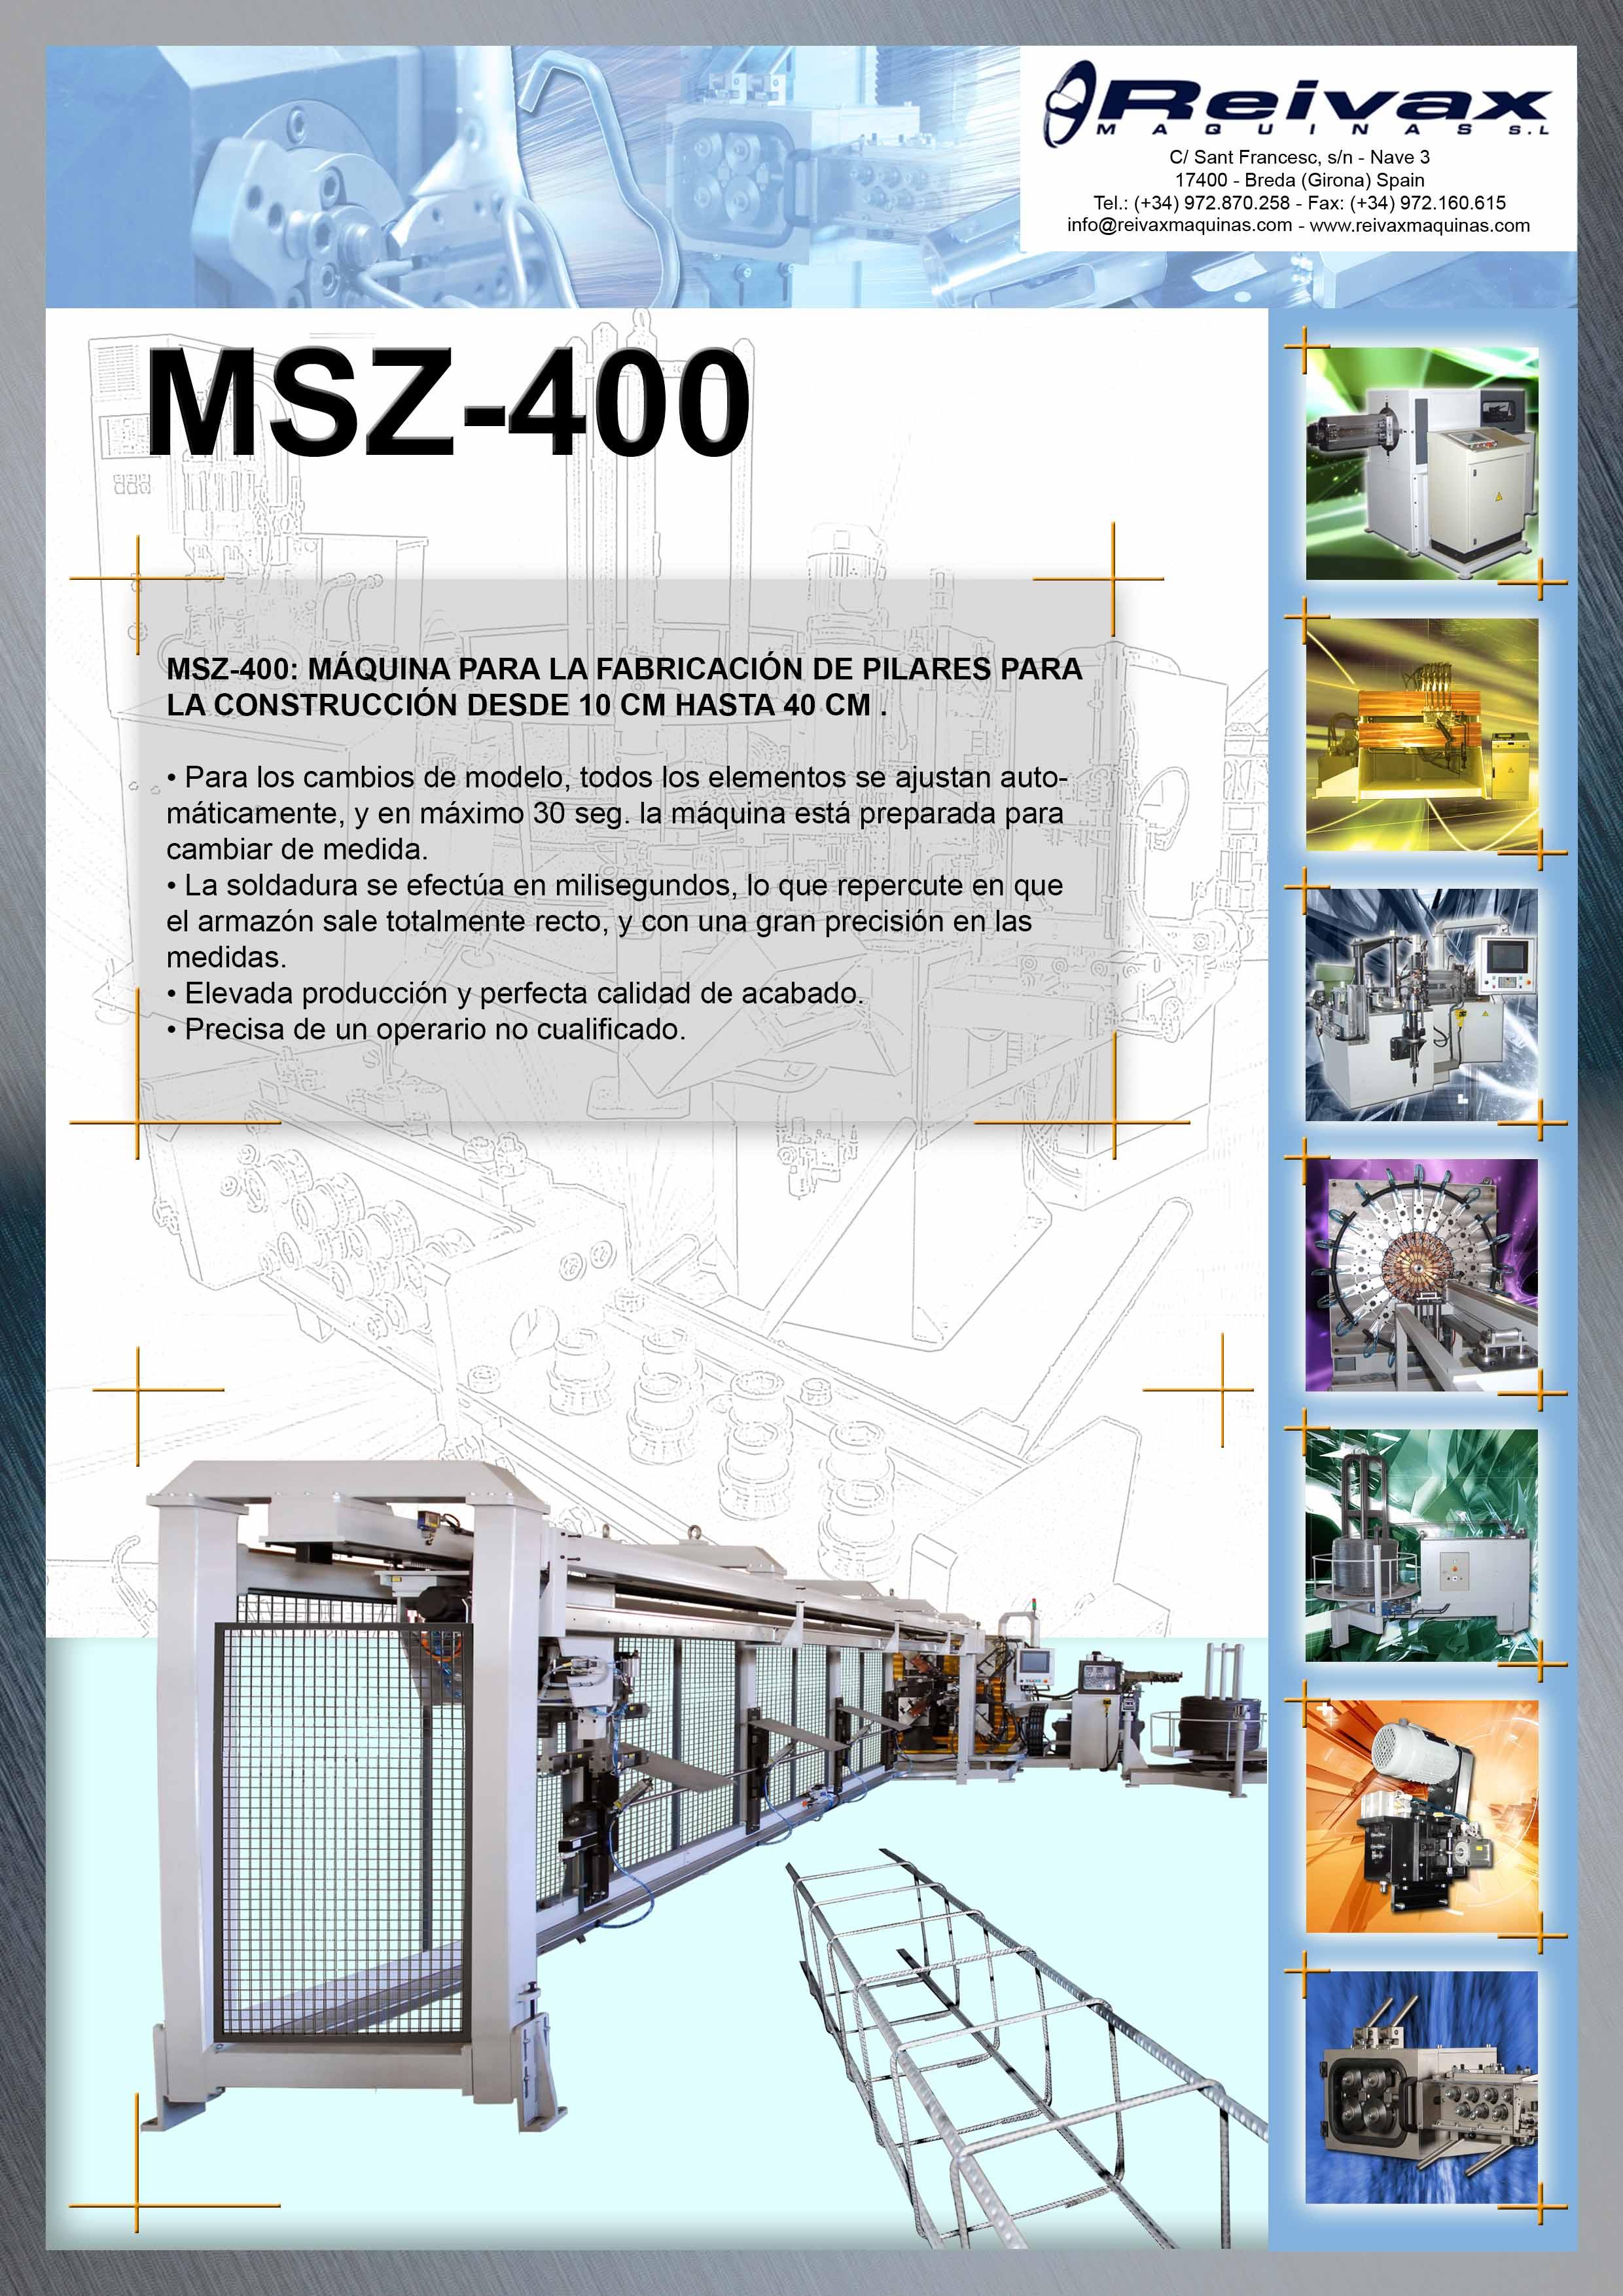 ReivaxMaquinas: Ficha Tecnica DH-1000